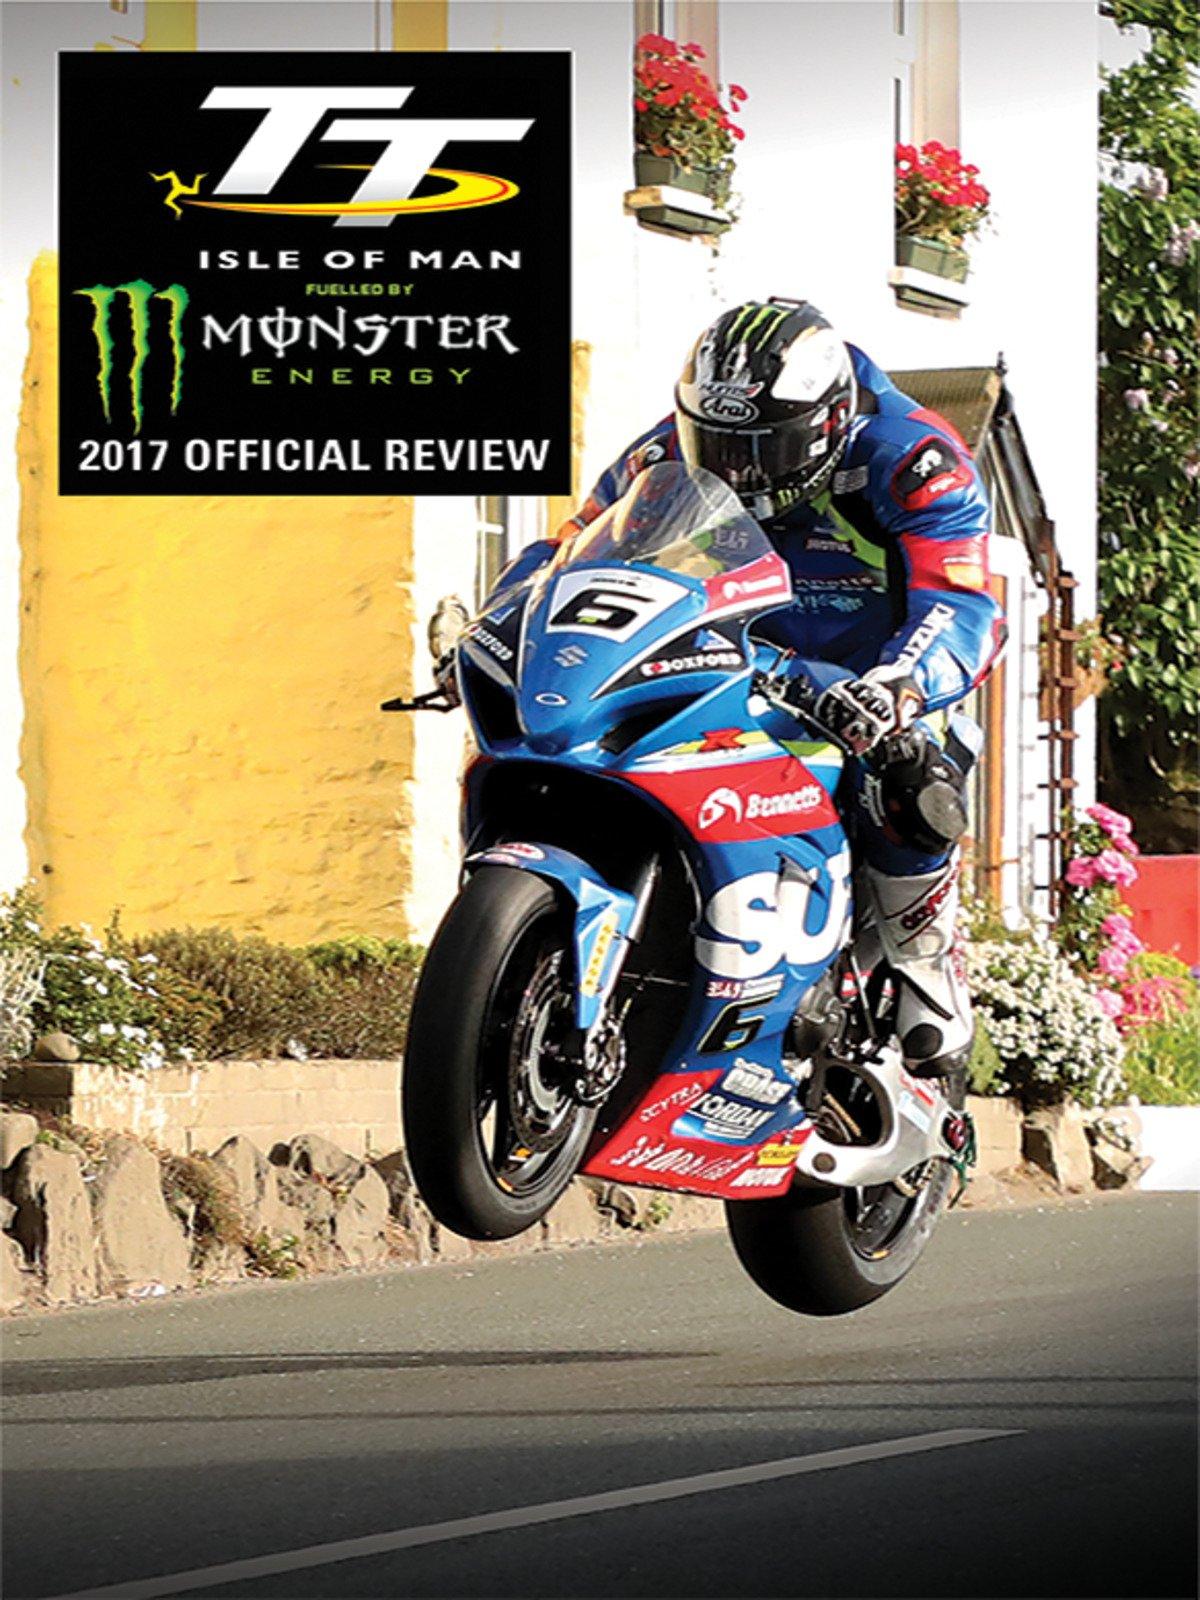 Isle of Man TT Review 2017